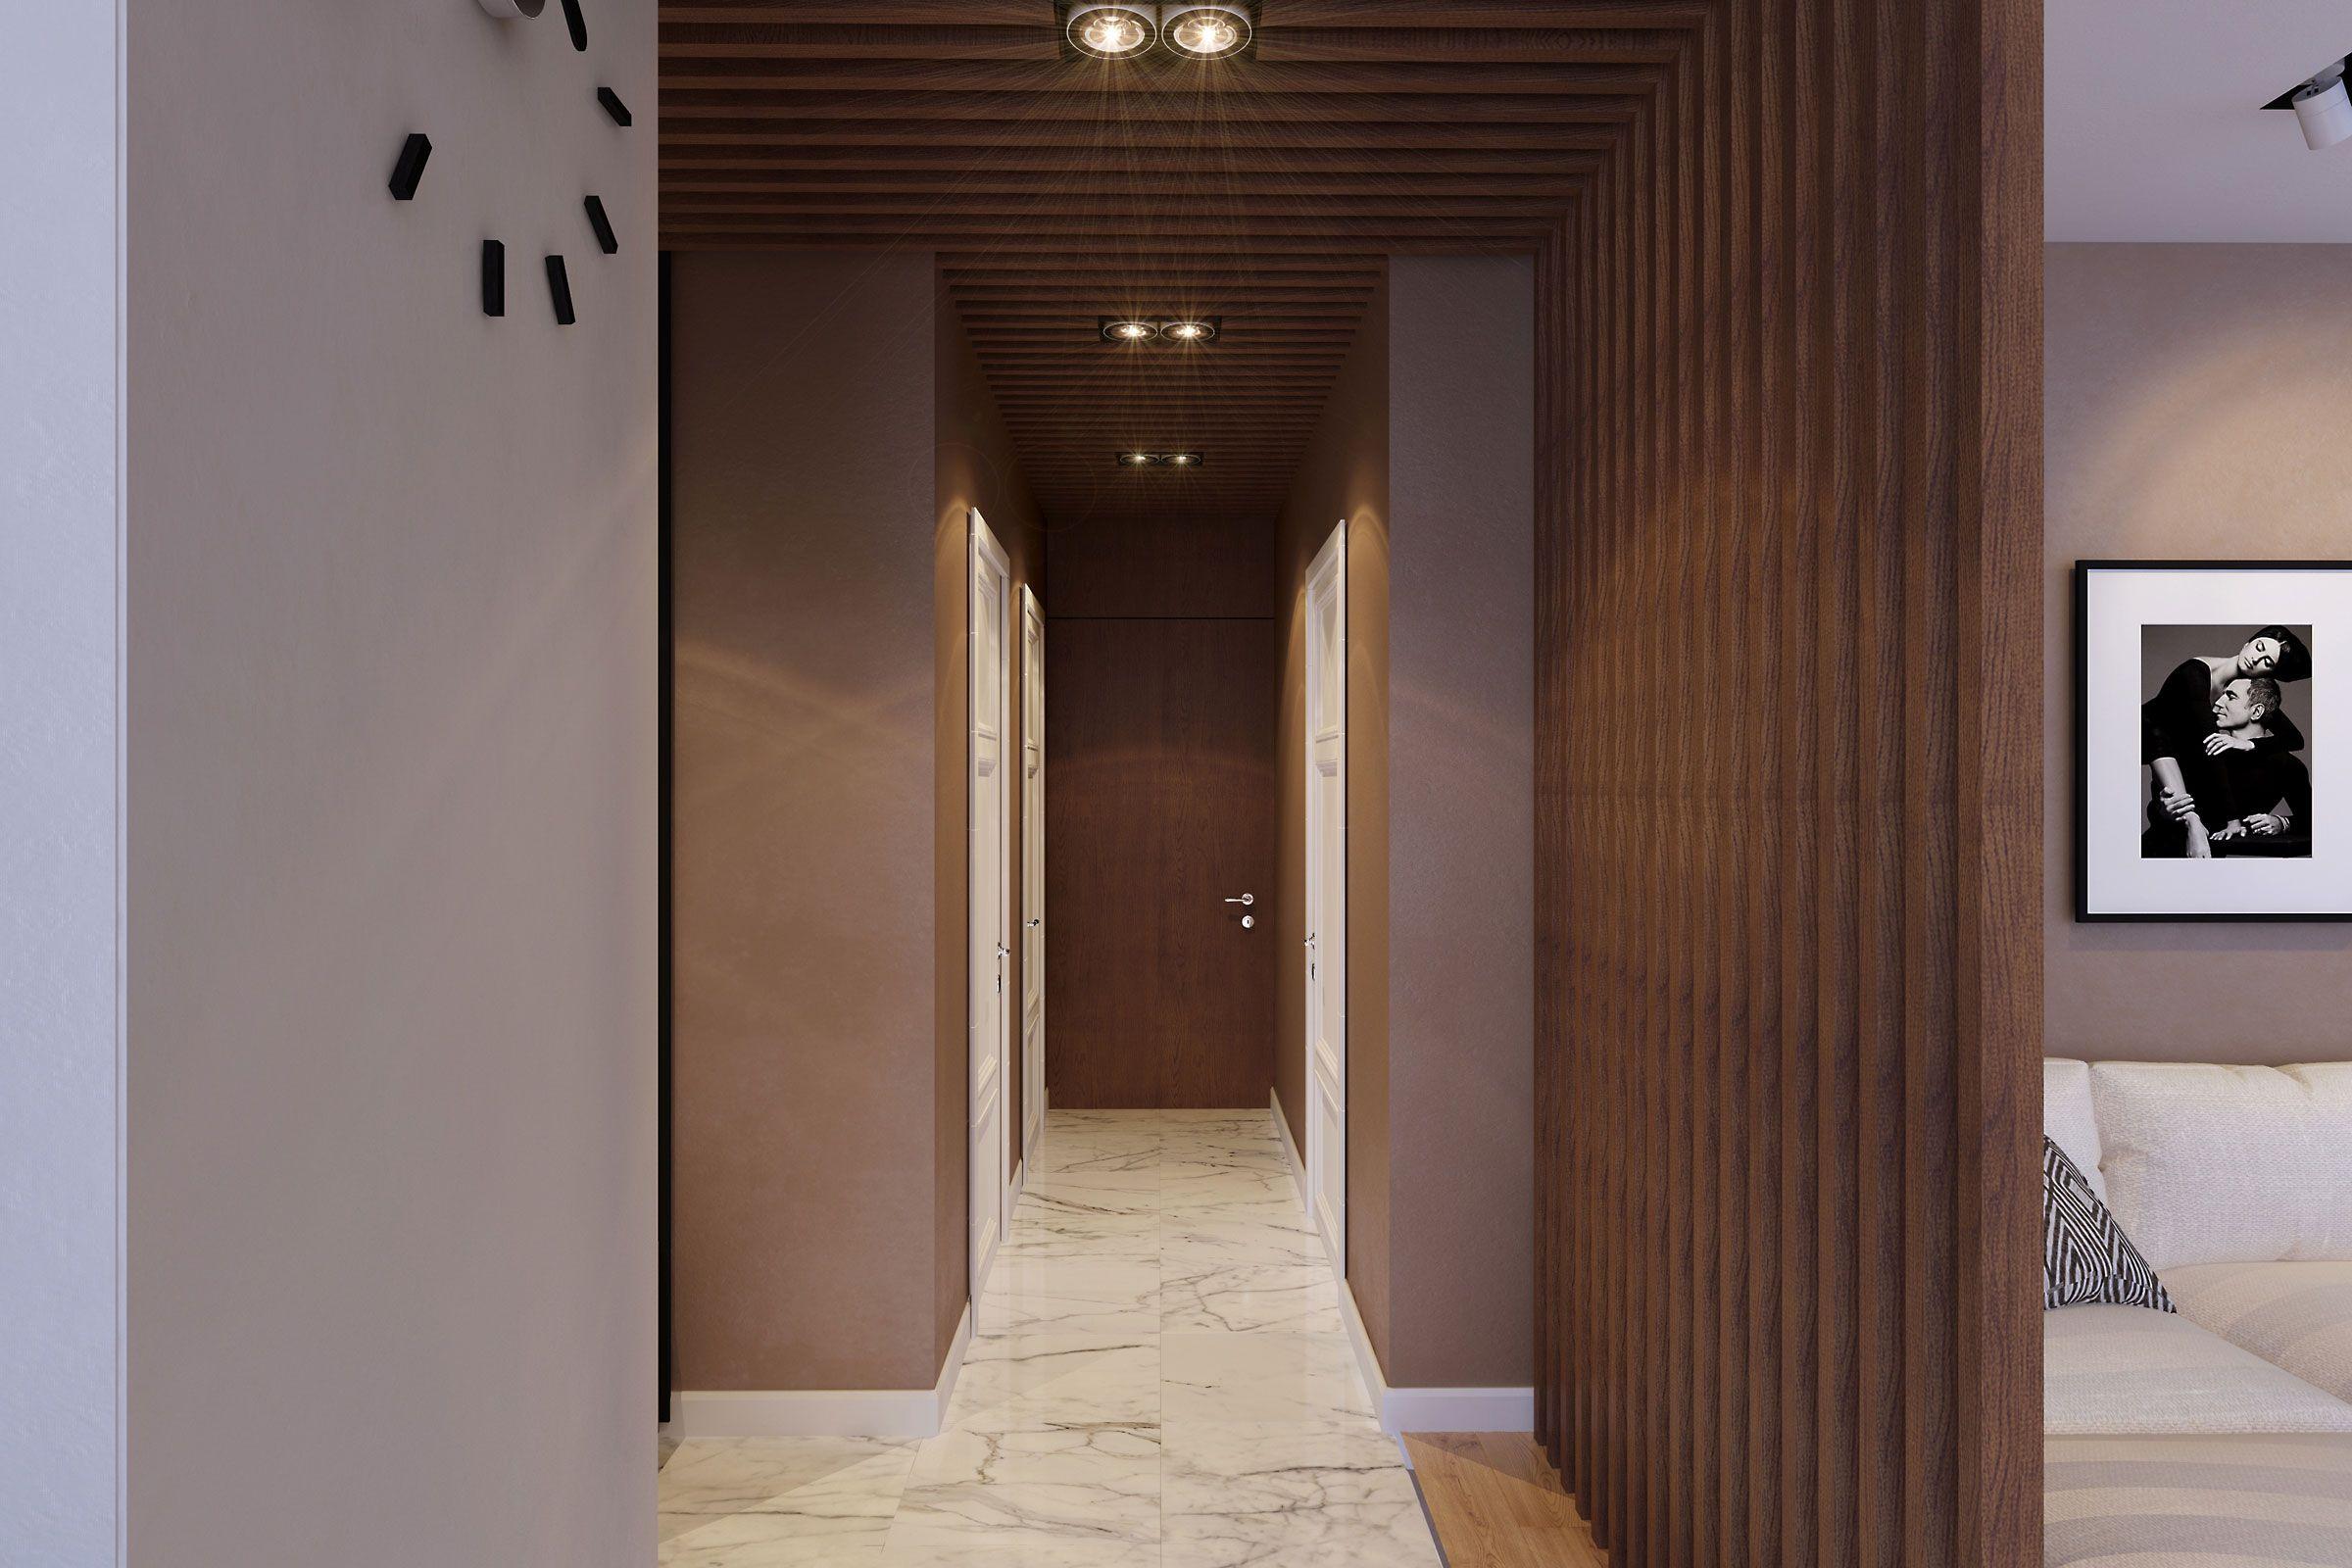 Bogatyrskiy-Modern-Apartment-01